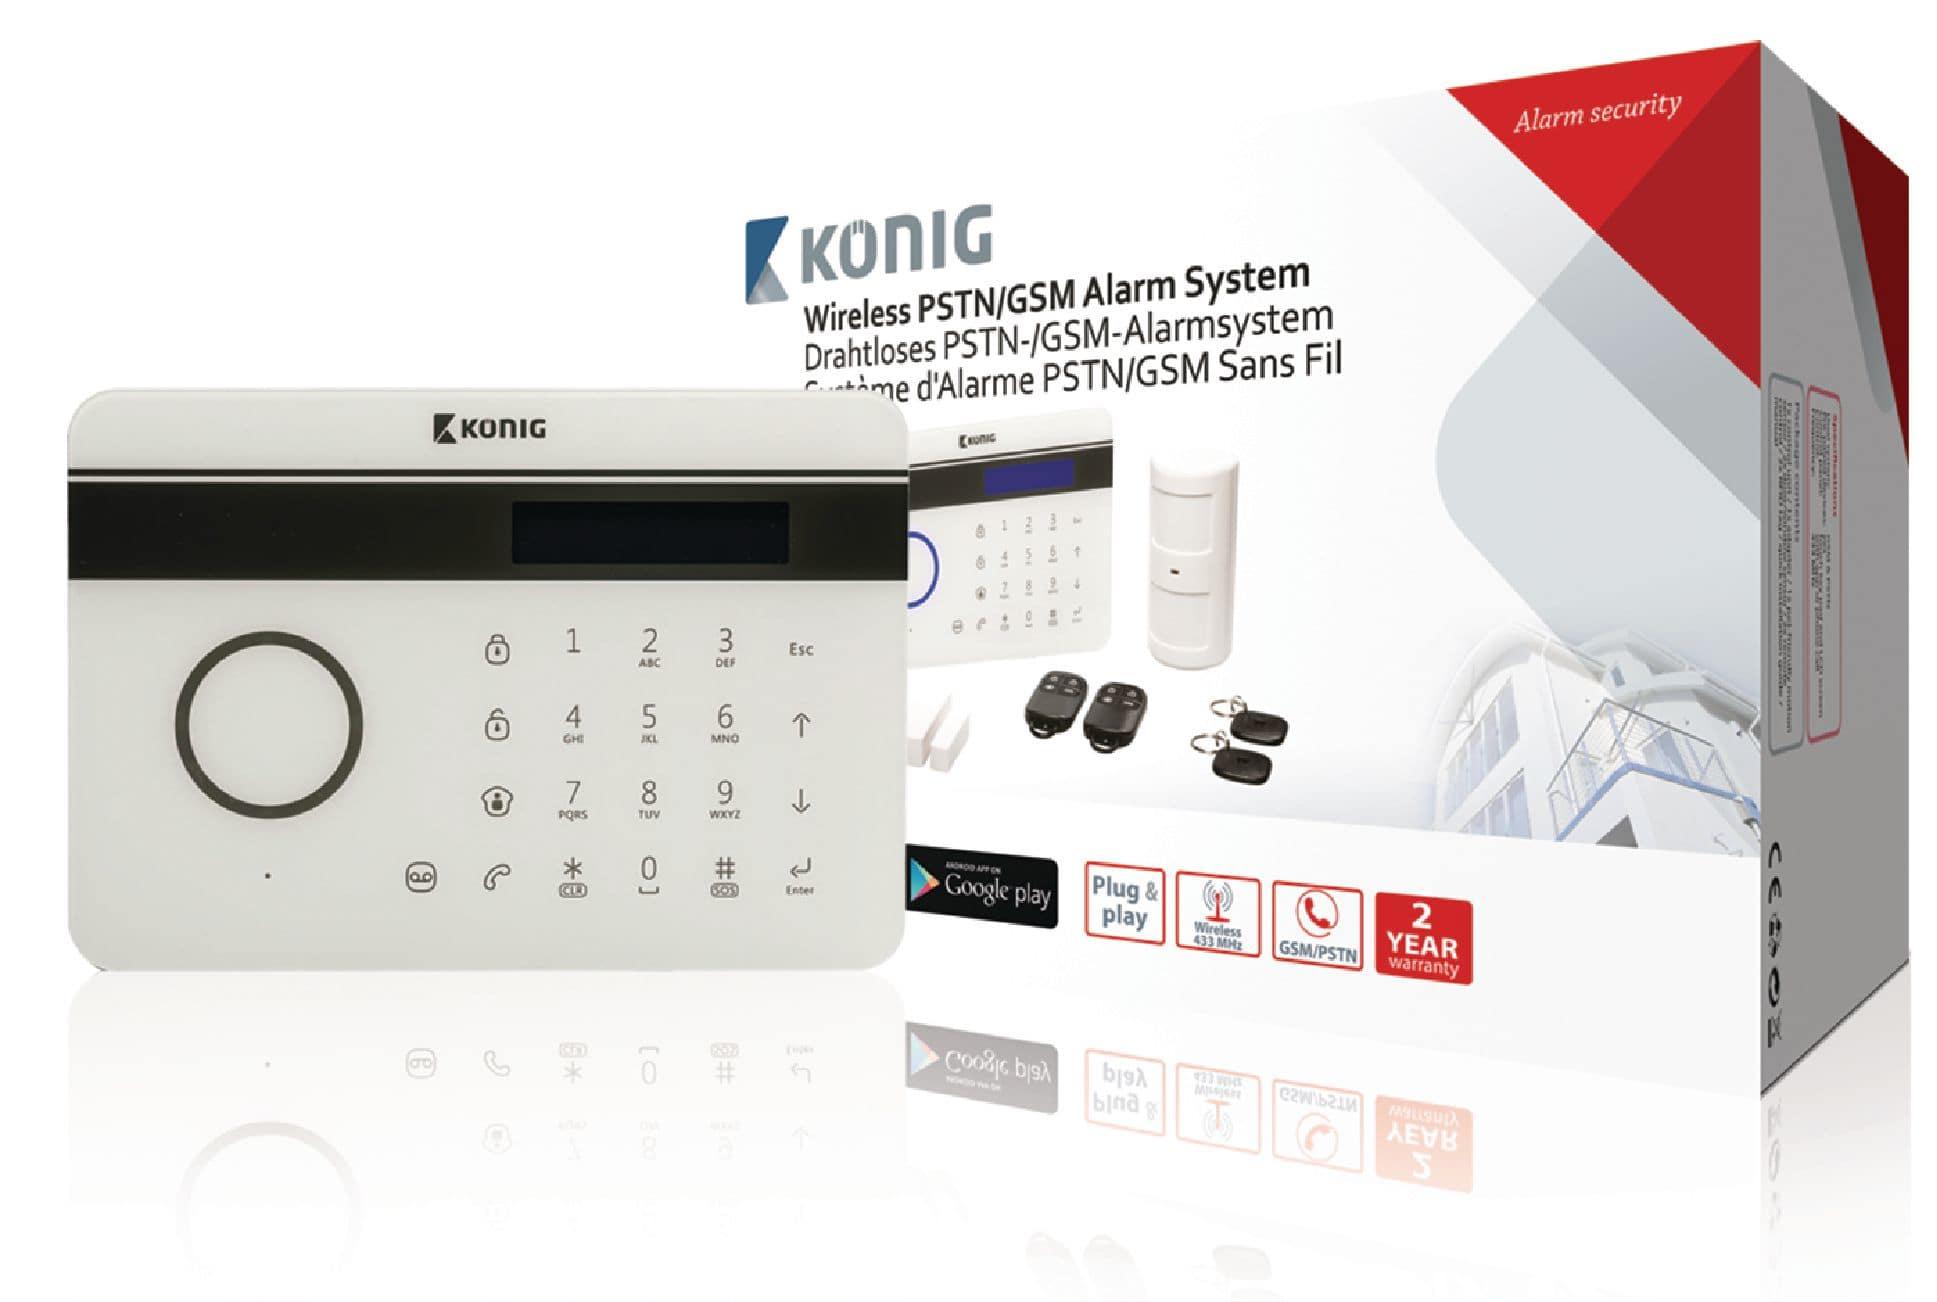 König SAS-ALARM300 drahtloses Festnetz-/GSM-Alarmsystem für 149,99 Euro